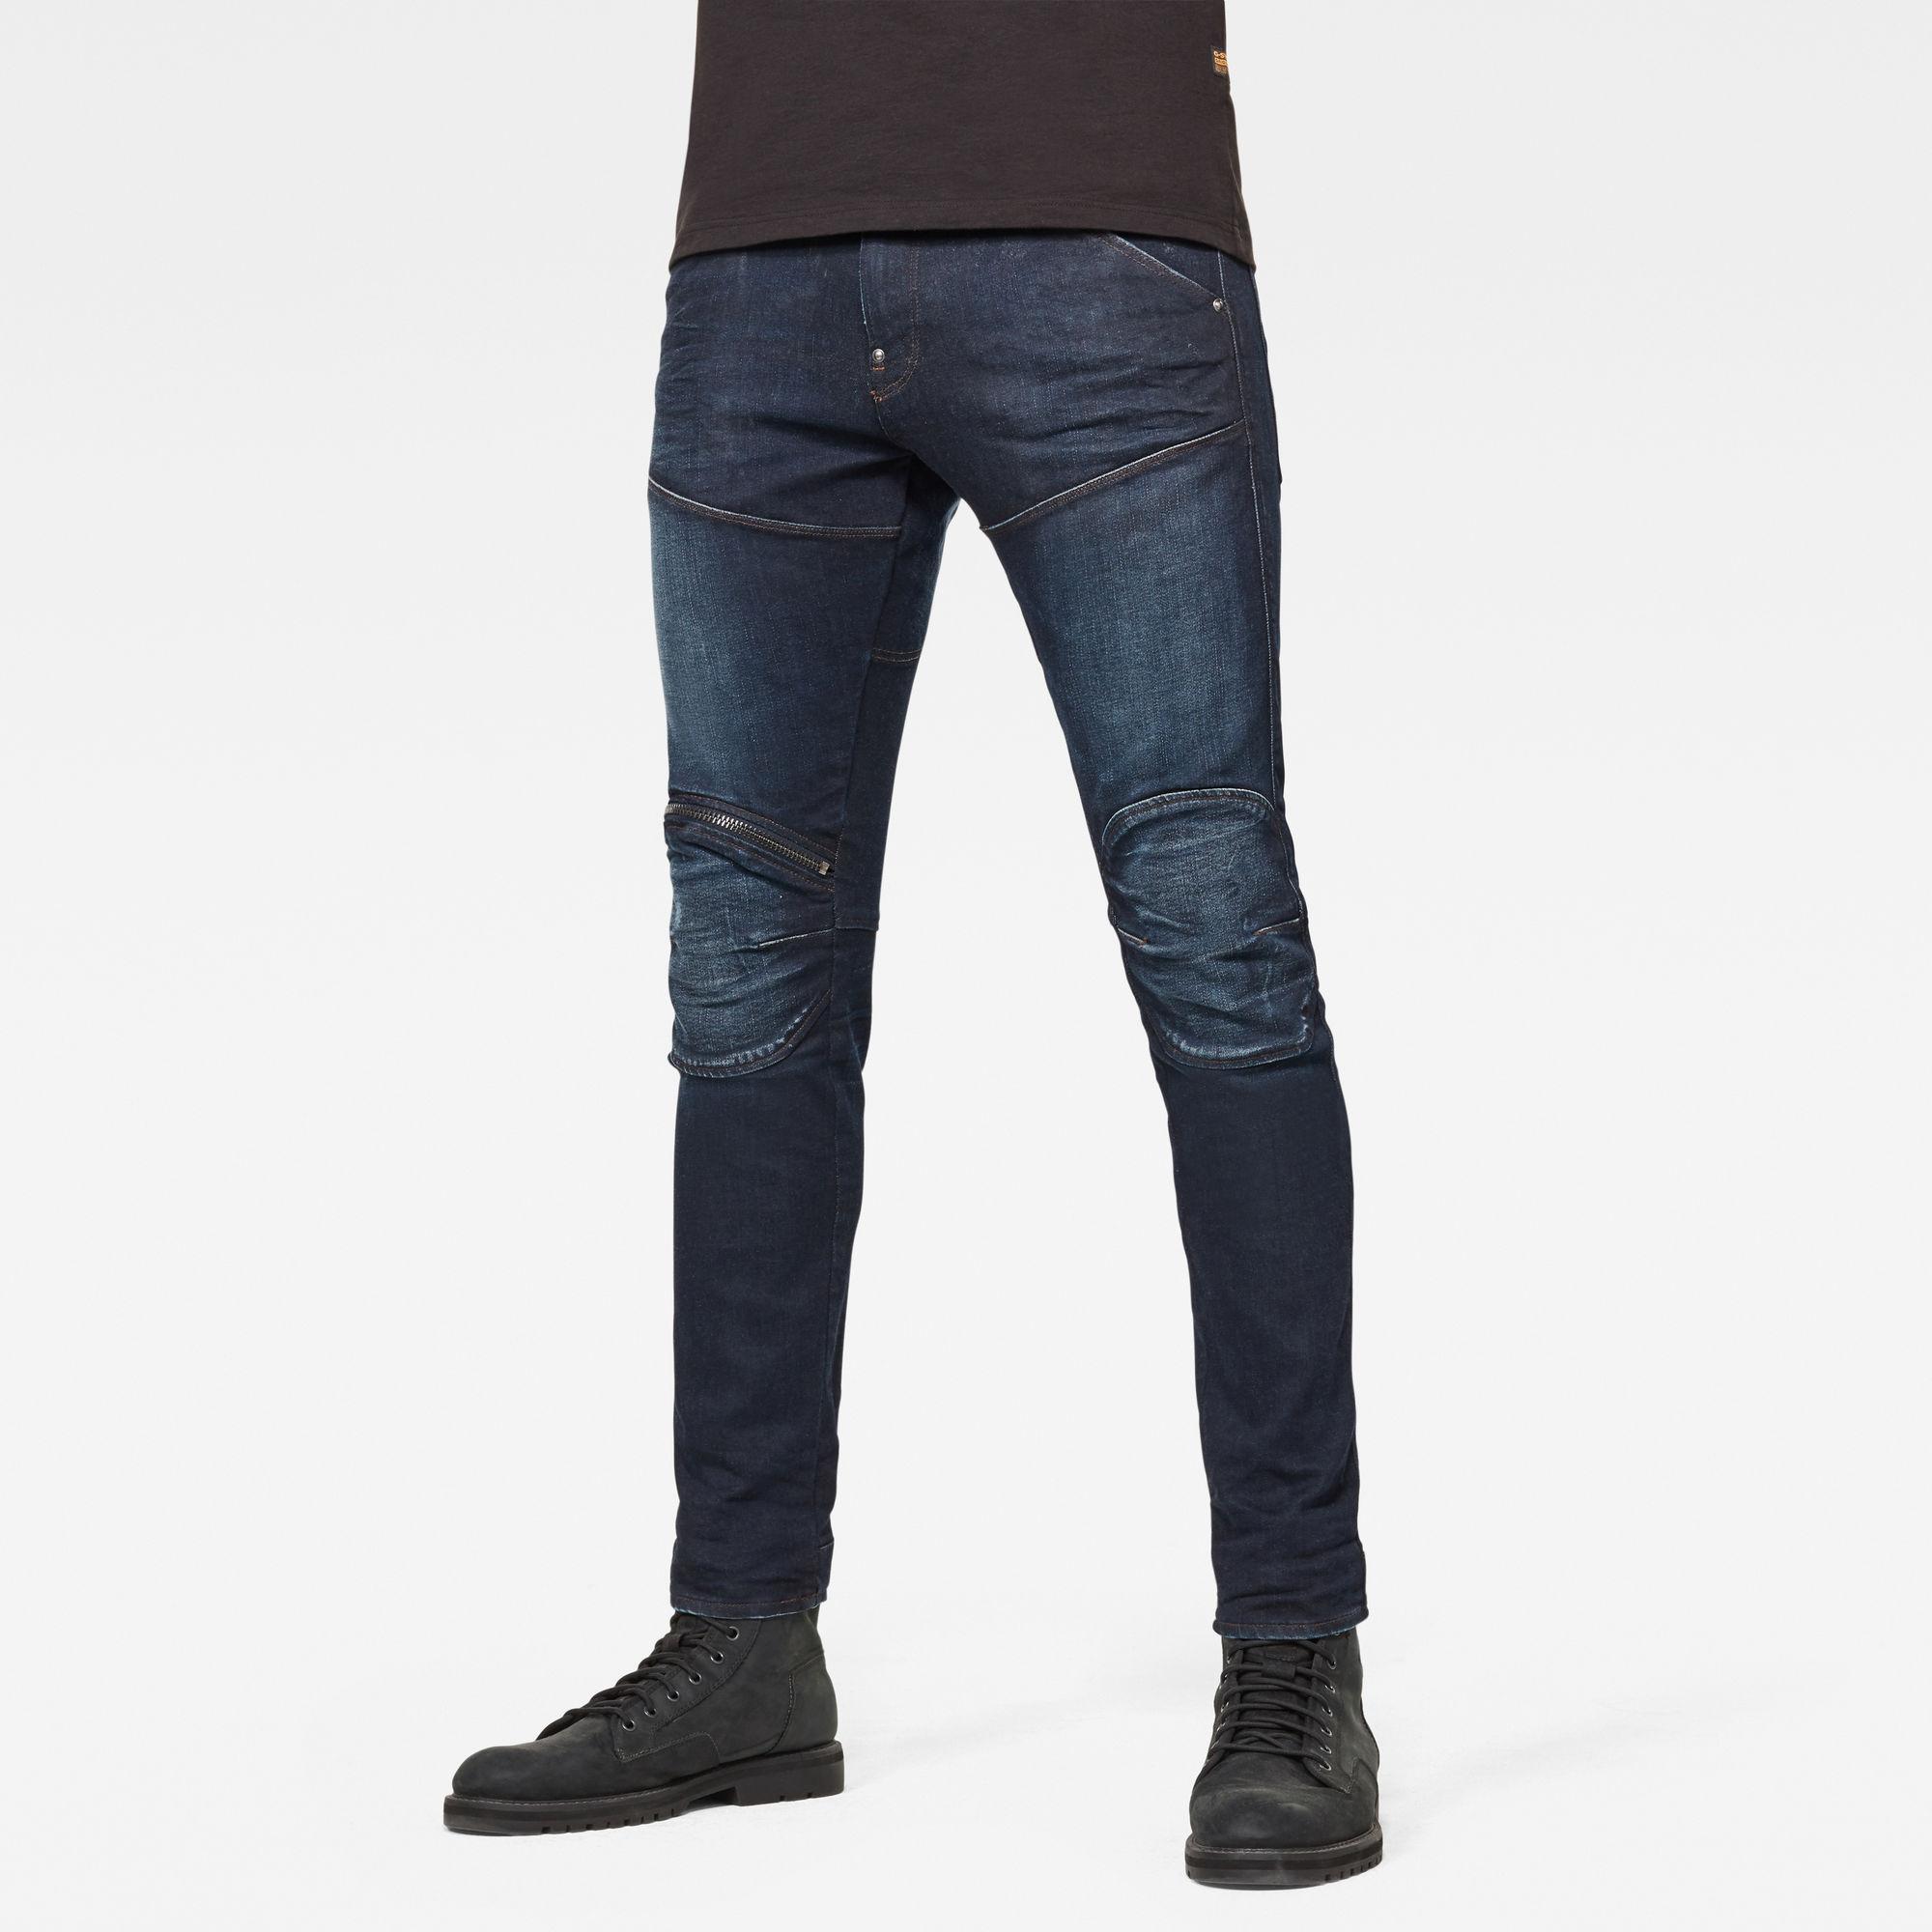 G-Star RAW Heren 5620 3D Zip Knee Skinny Jeans Donkerblauw